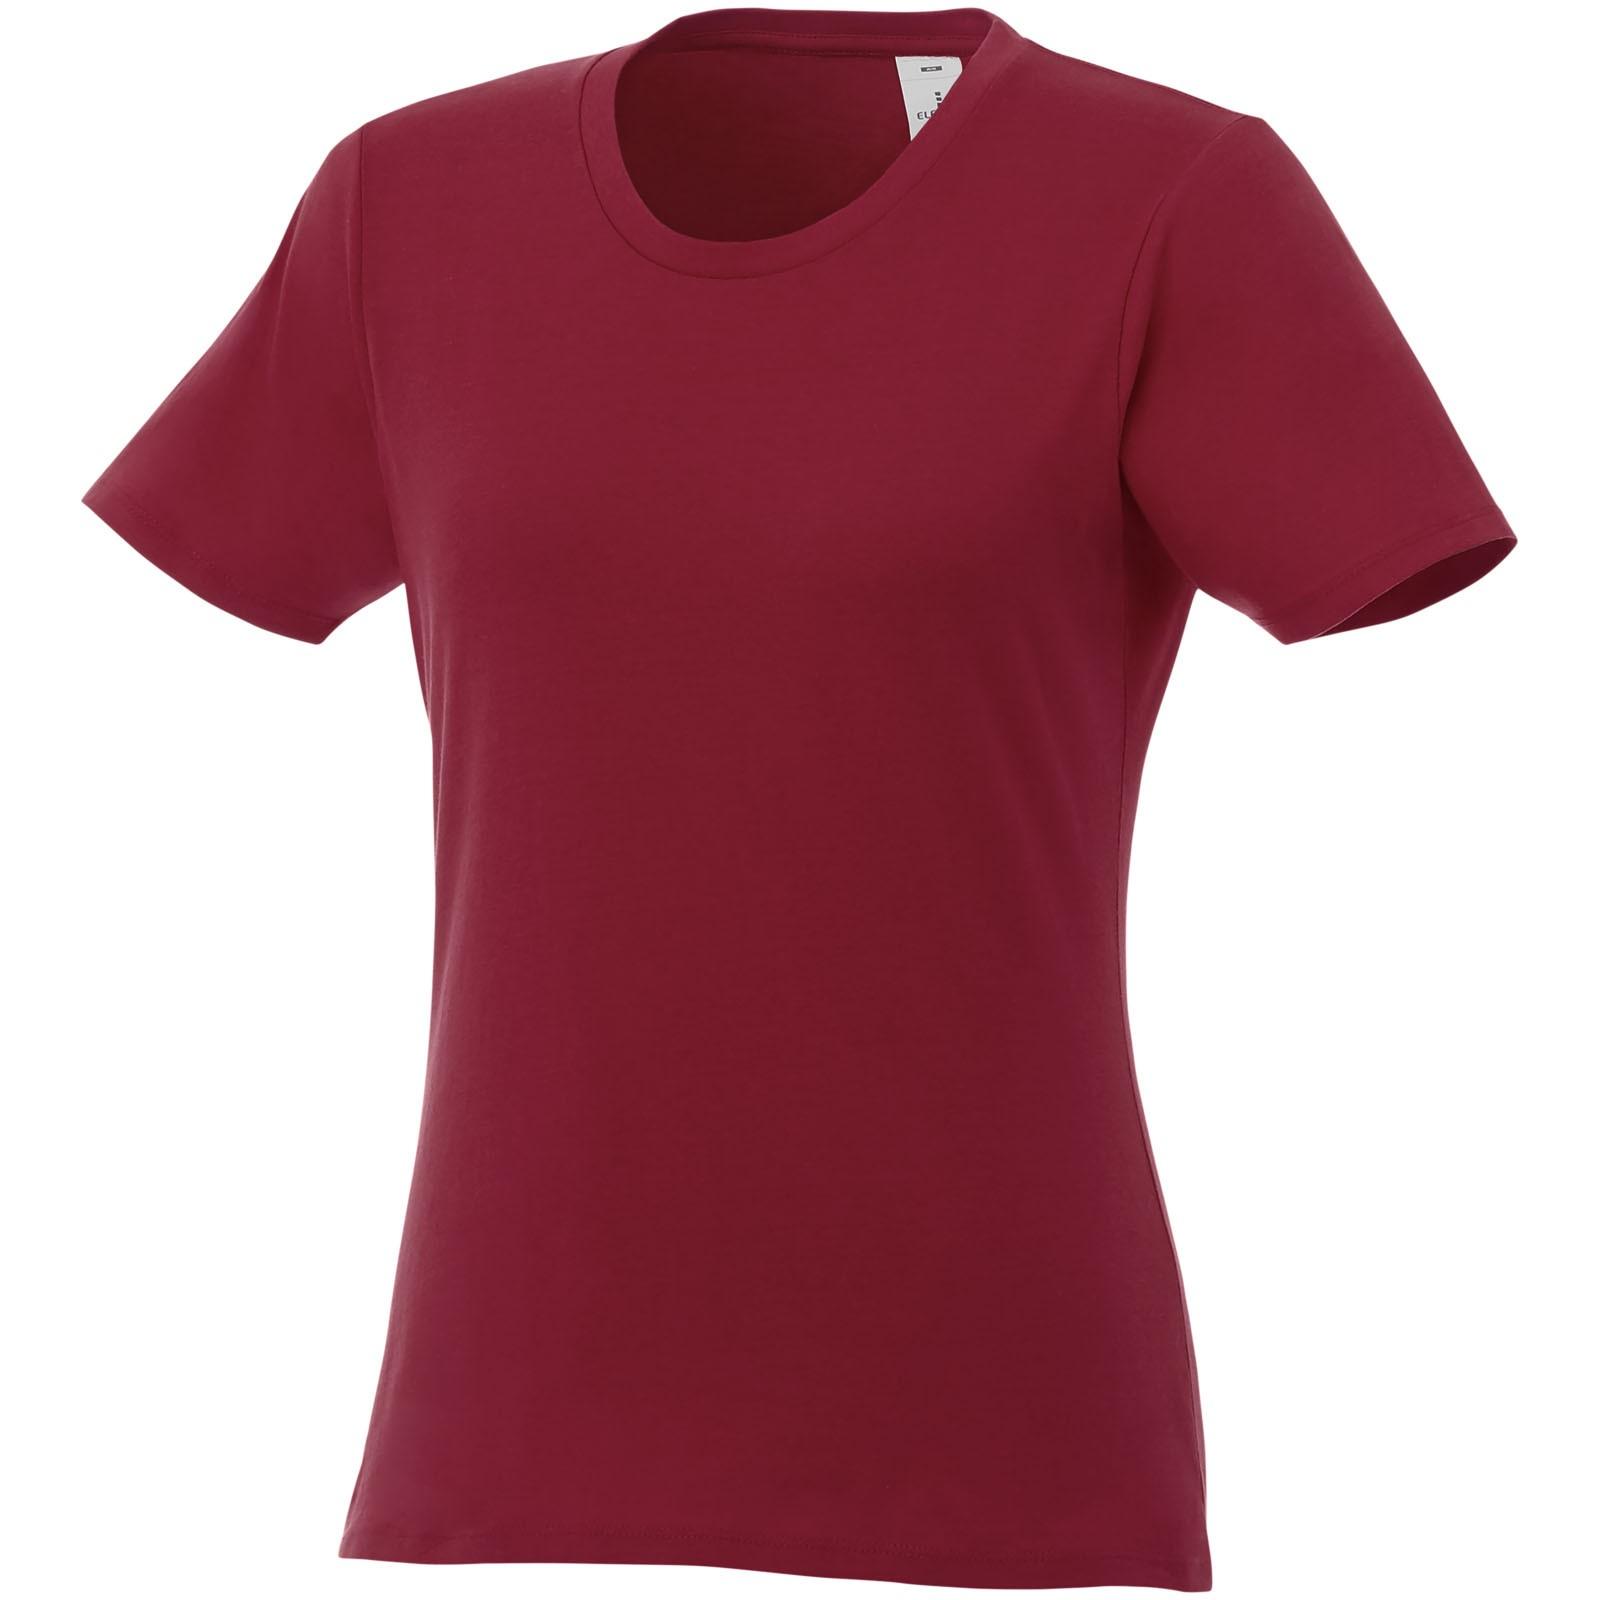 Heros short sleeve women's t-shirt - Burgundy / S